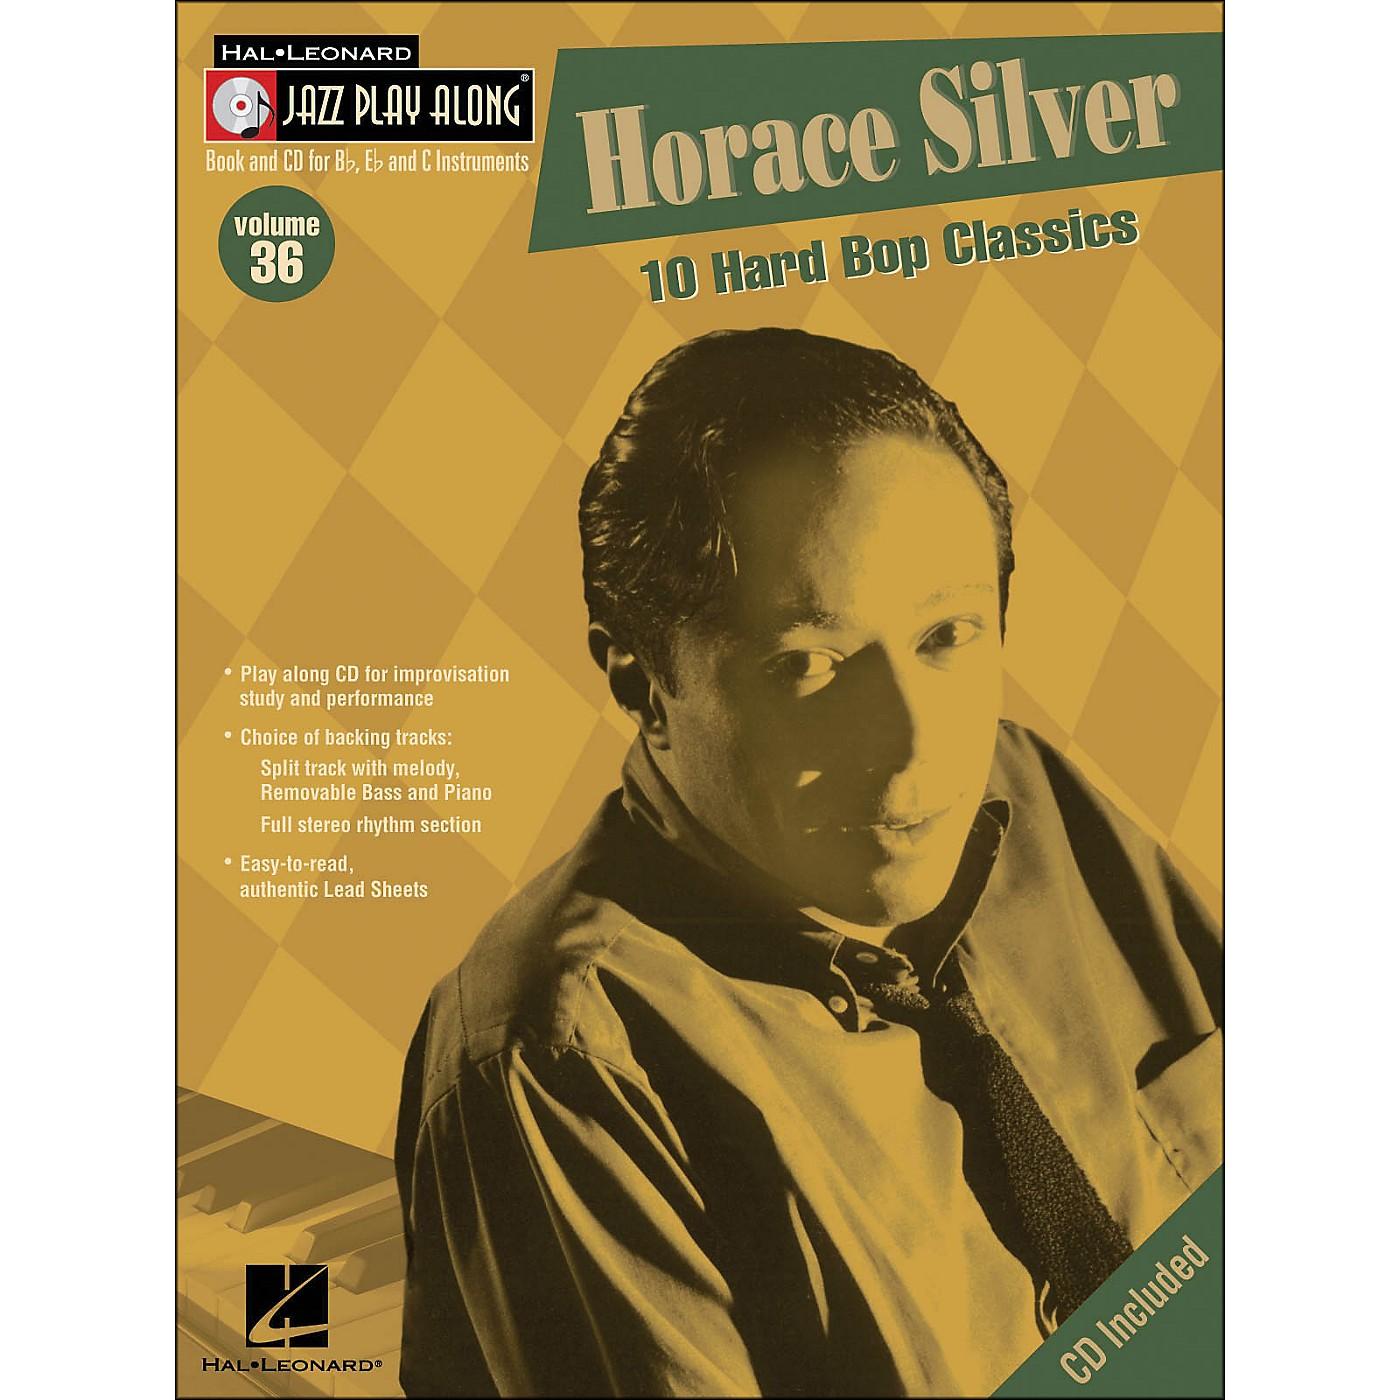 Hal Leonard Horace Silver Volume 36 Book/CD Jazz Play Along thumbnail